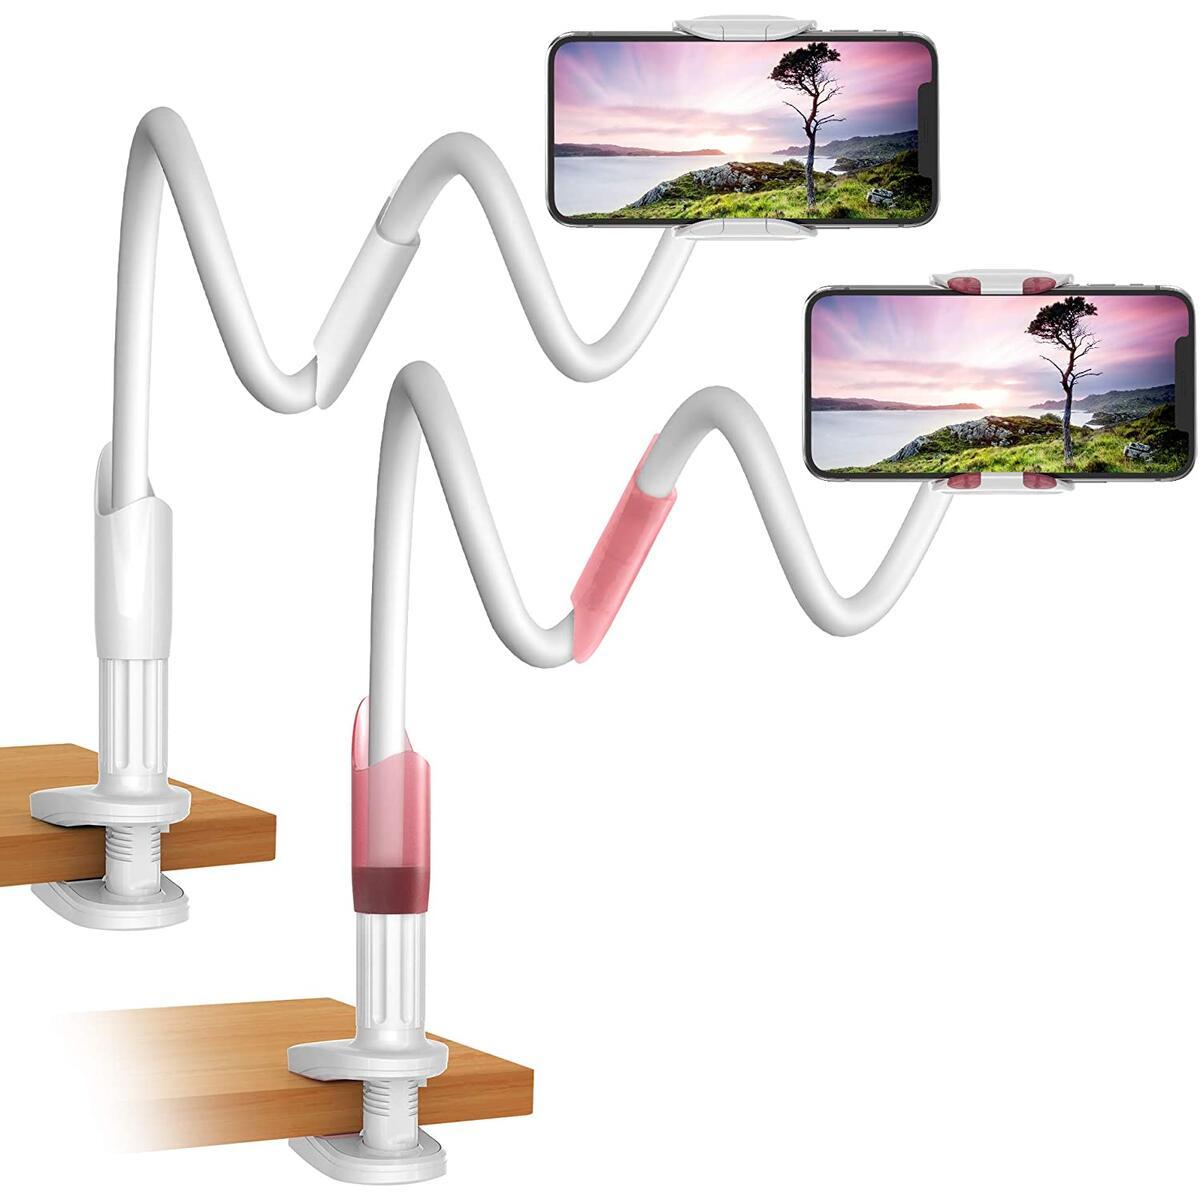 Gooseneck Phone & Tablet Holder for Desk, Night Stand, Headboard (2-Pack) - White/Pink